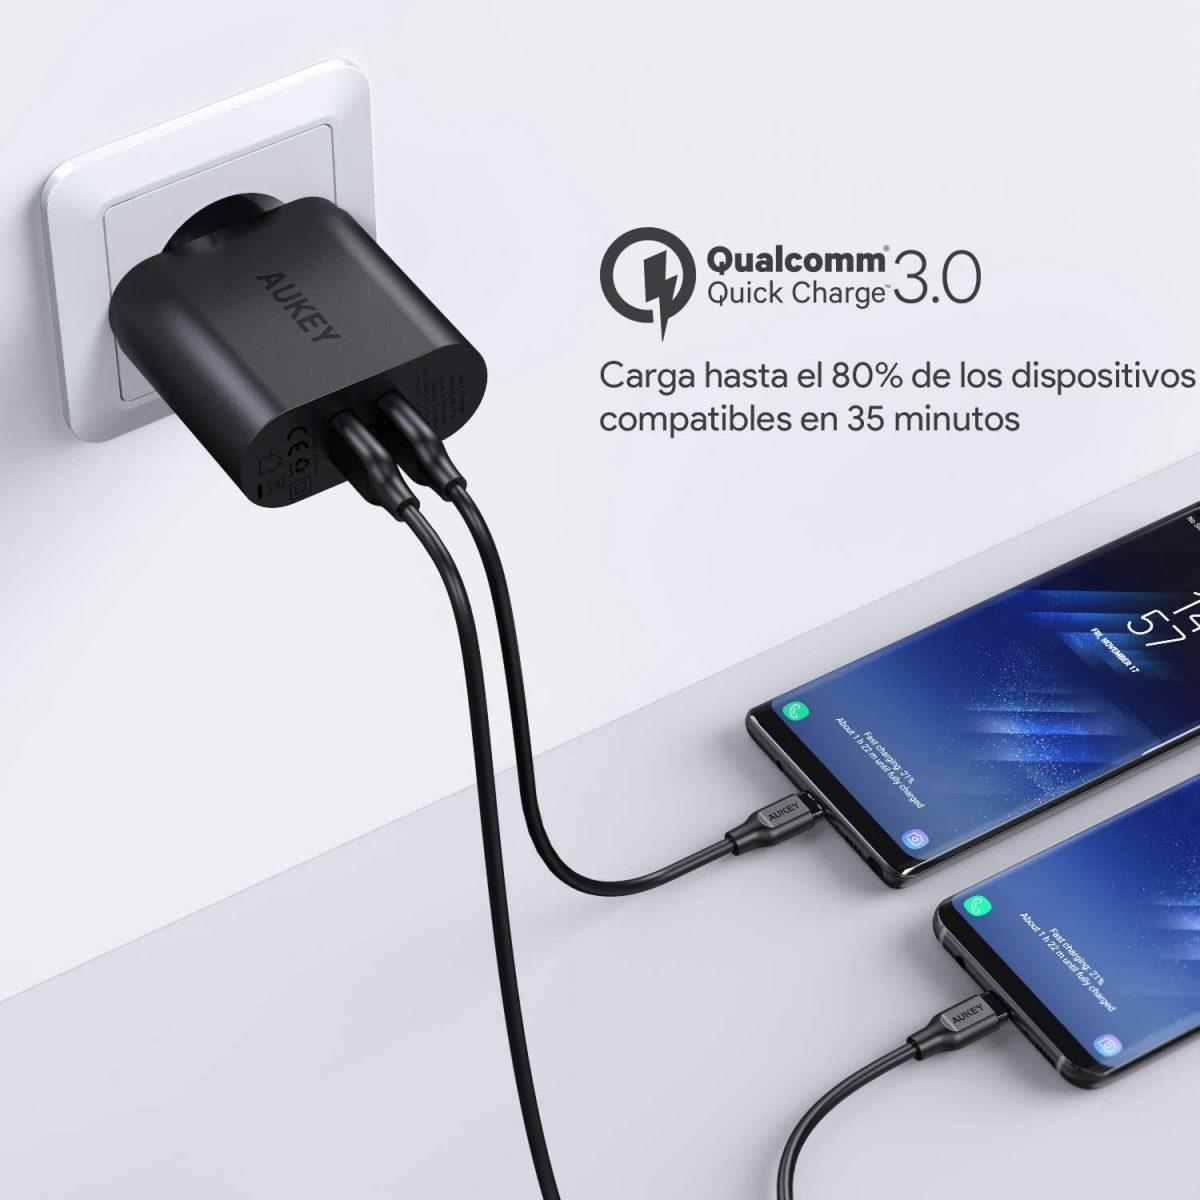 Cargador Aukey Quick Charge 3.0 barato scaled SuperChollos